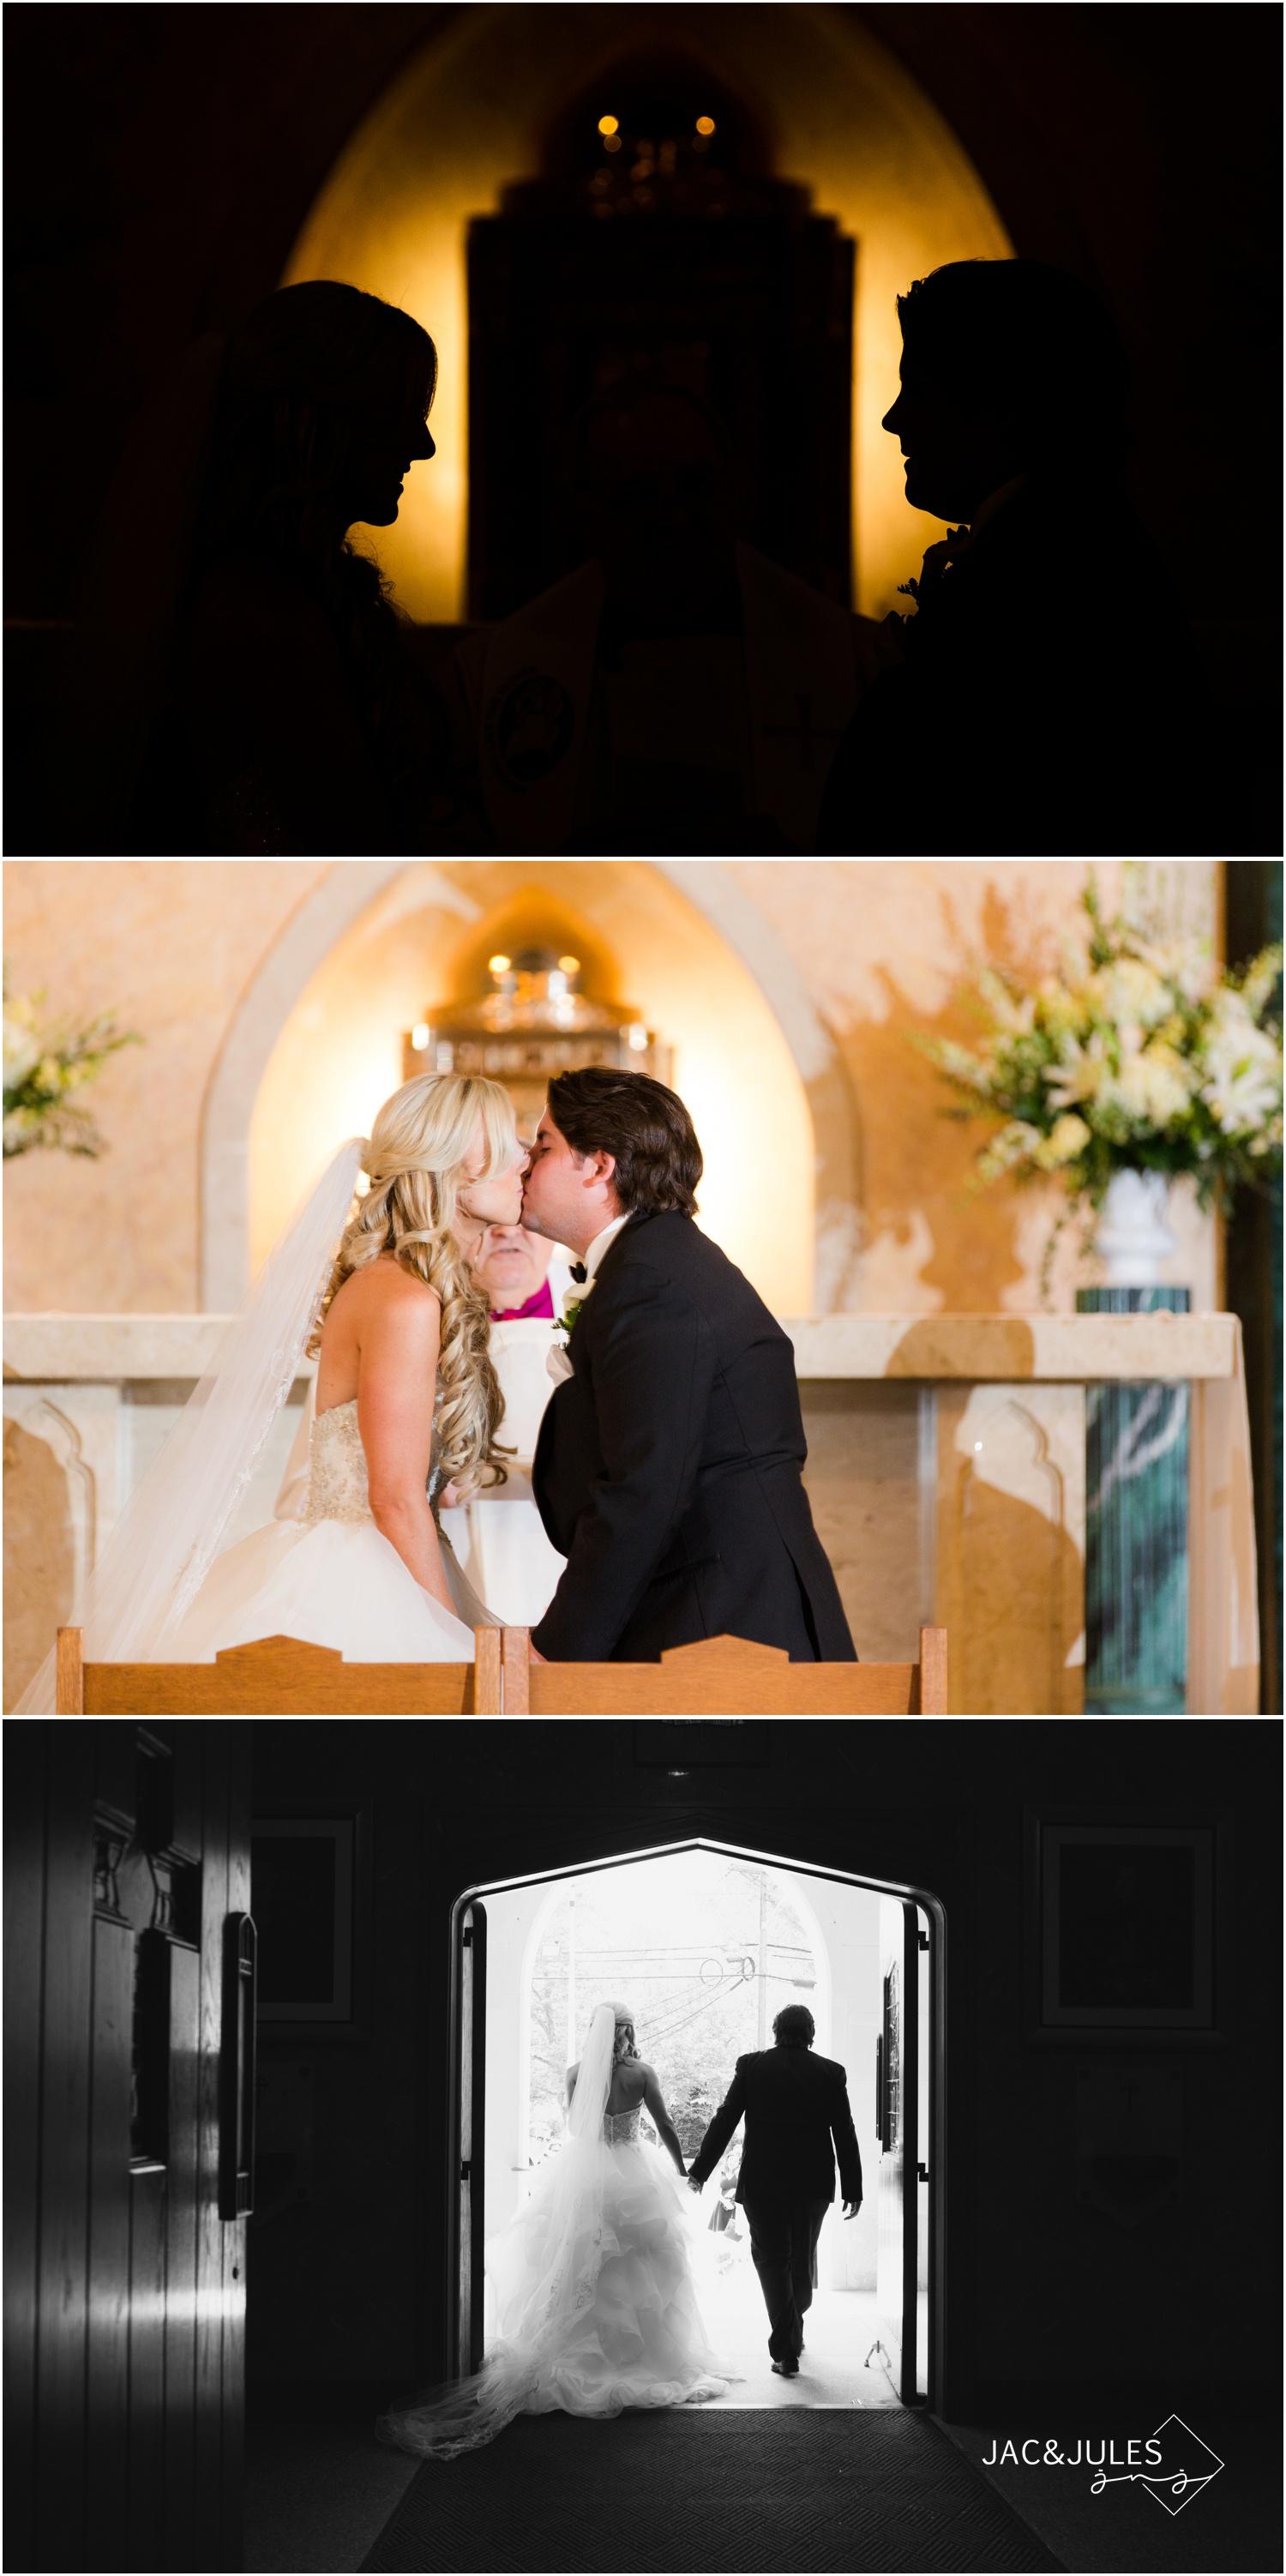 wedding ceremony at St. Francis in Metuchen, NJ.